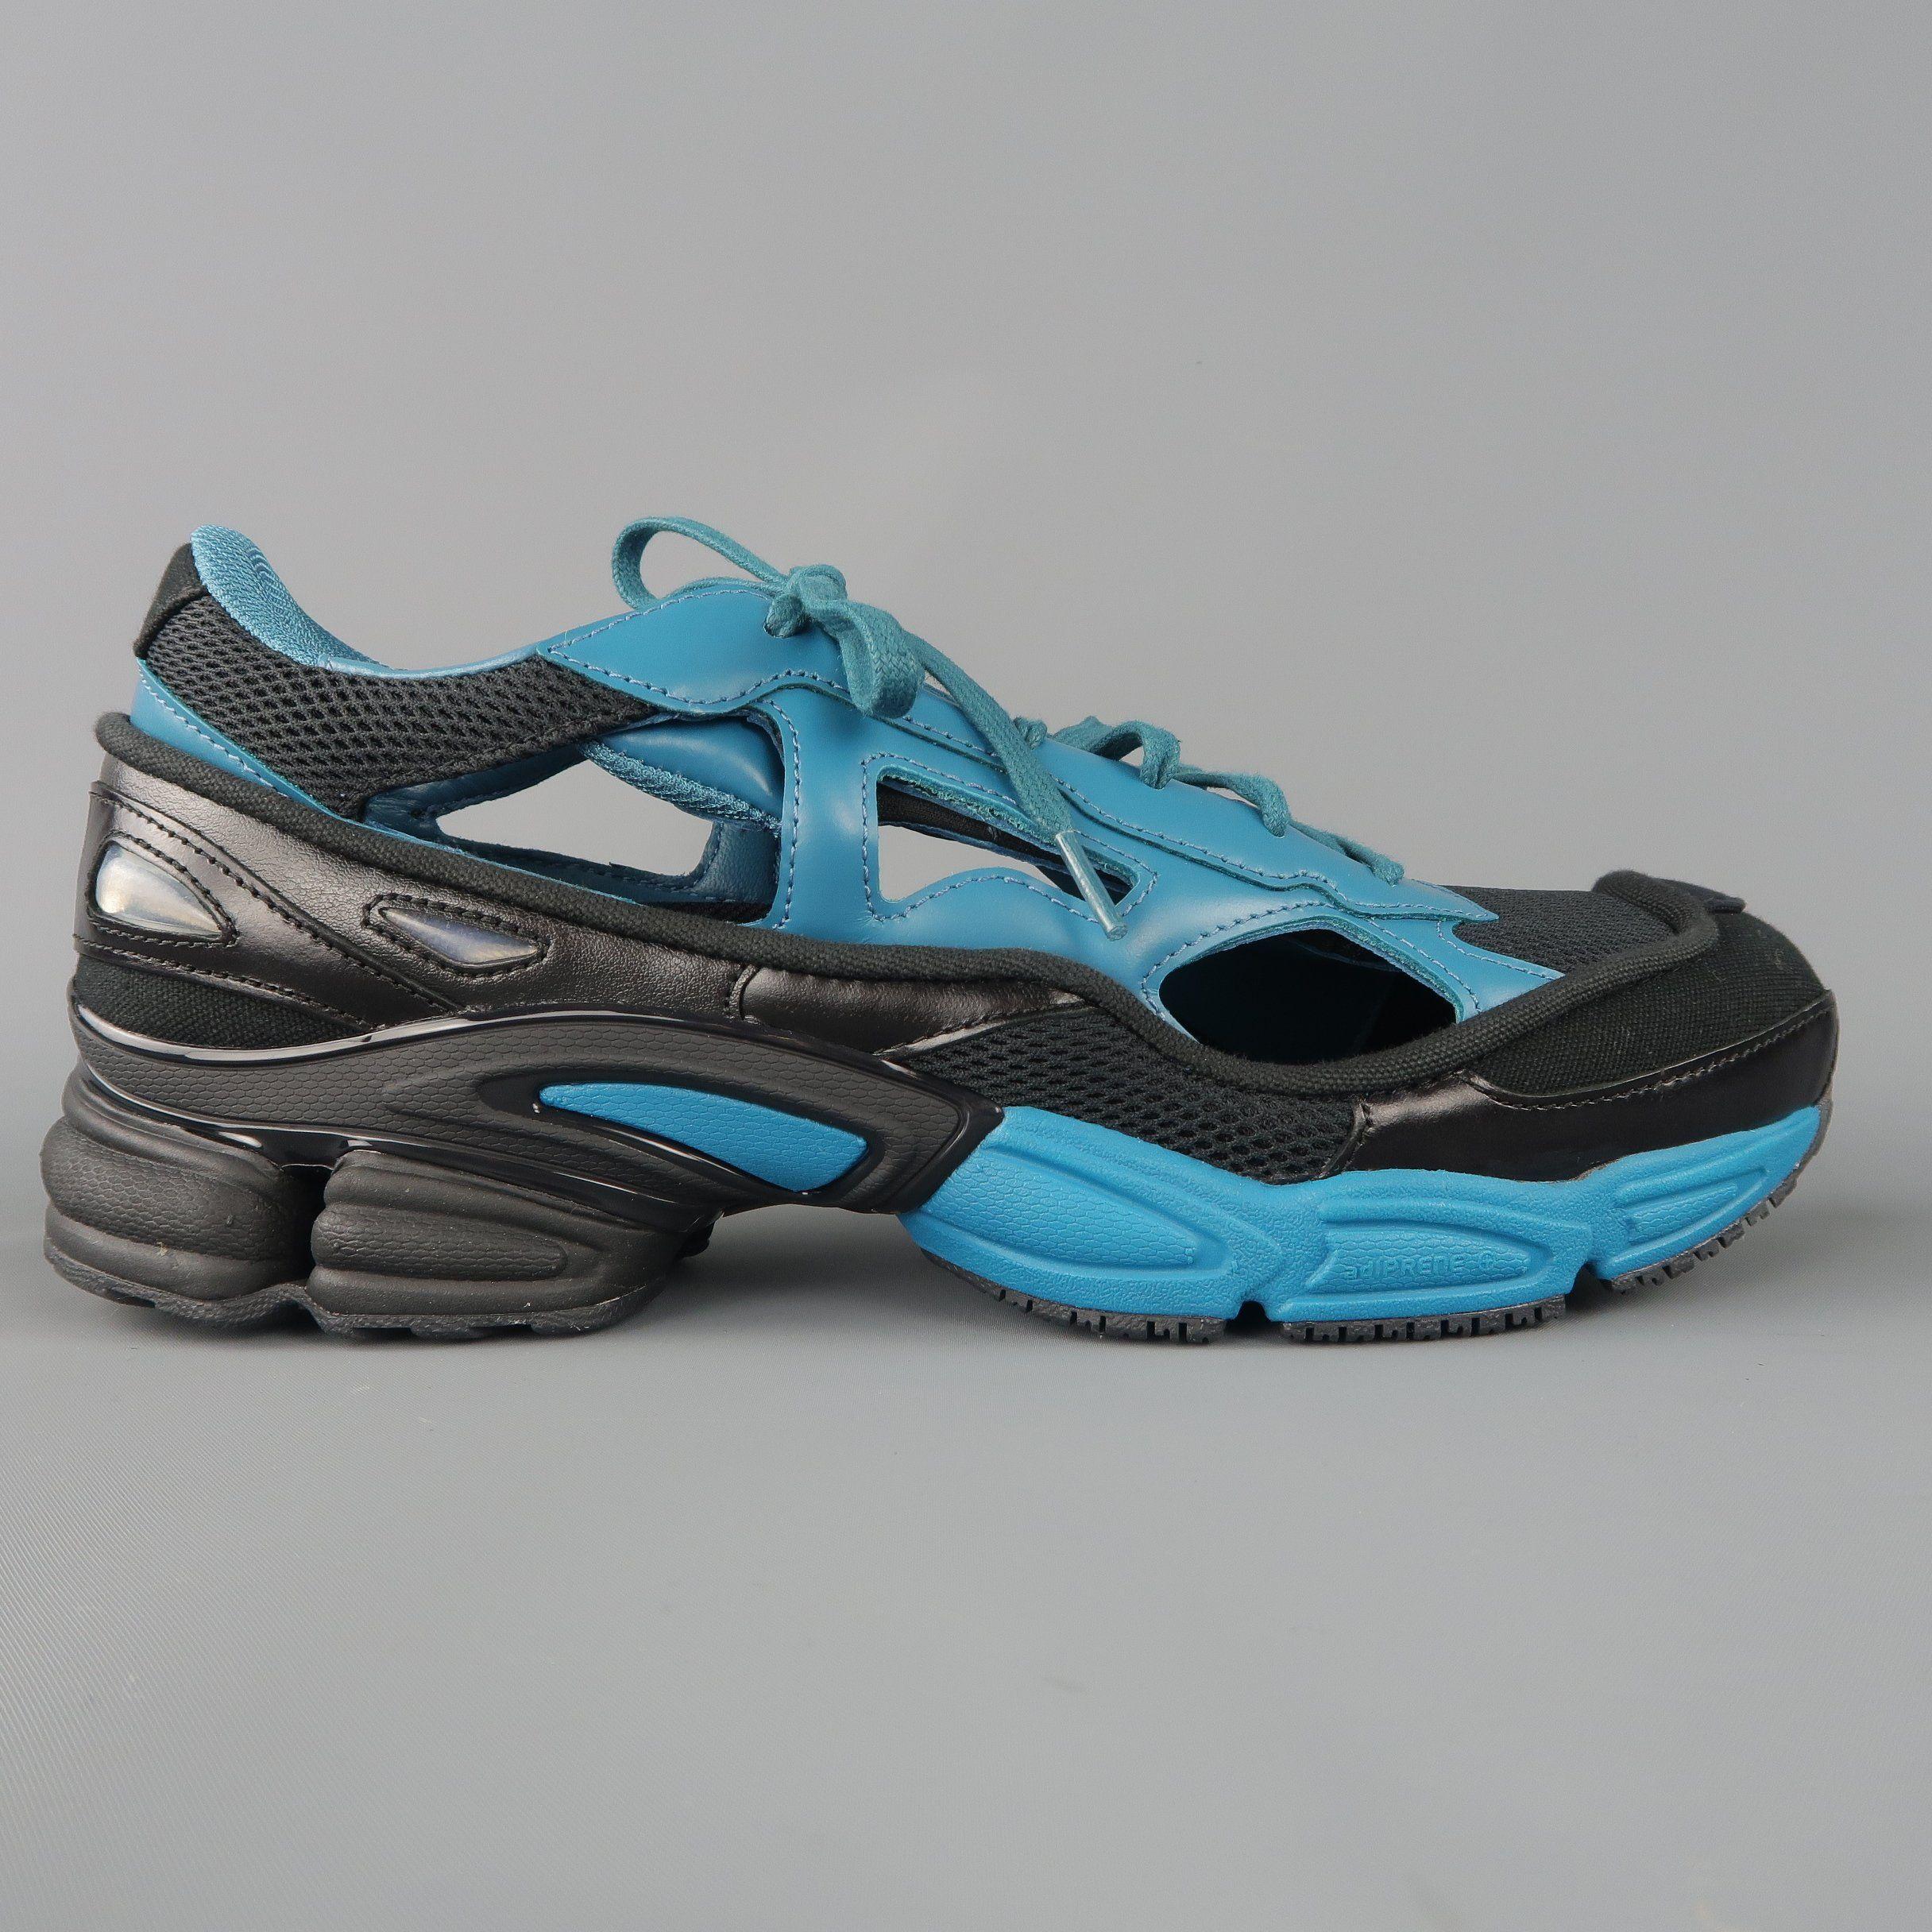 Adidas Raf Simons Size 10 Black \u0026 Blue